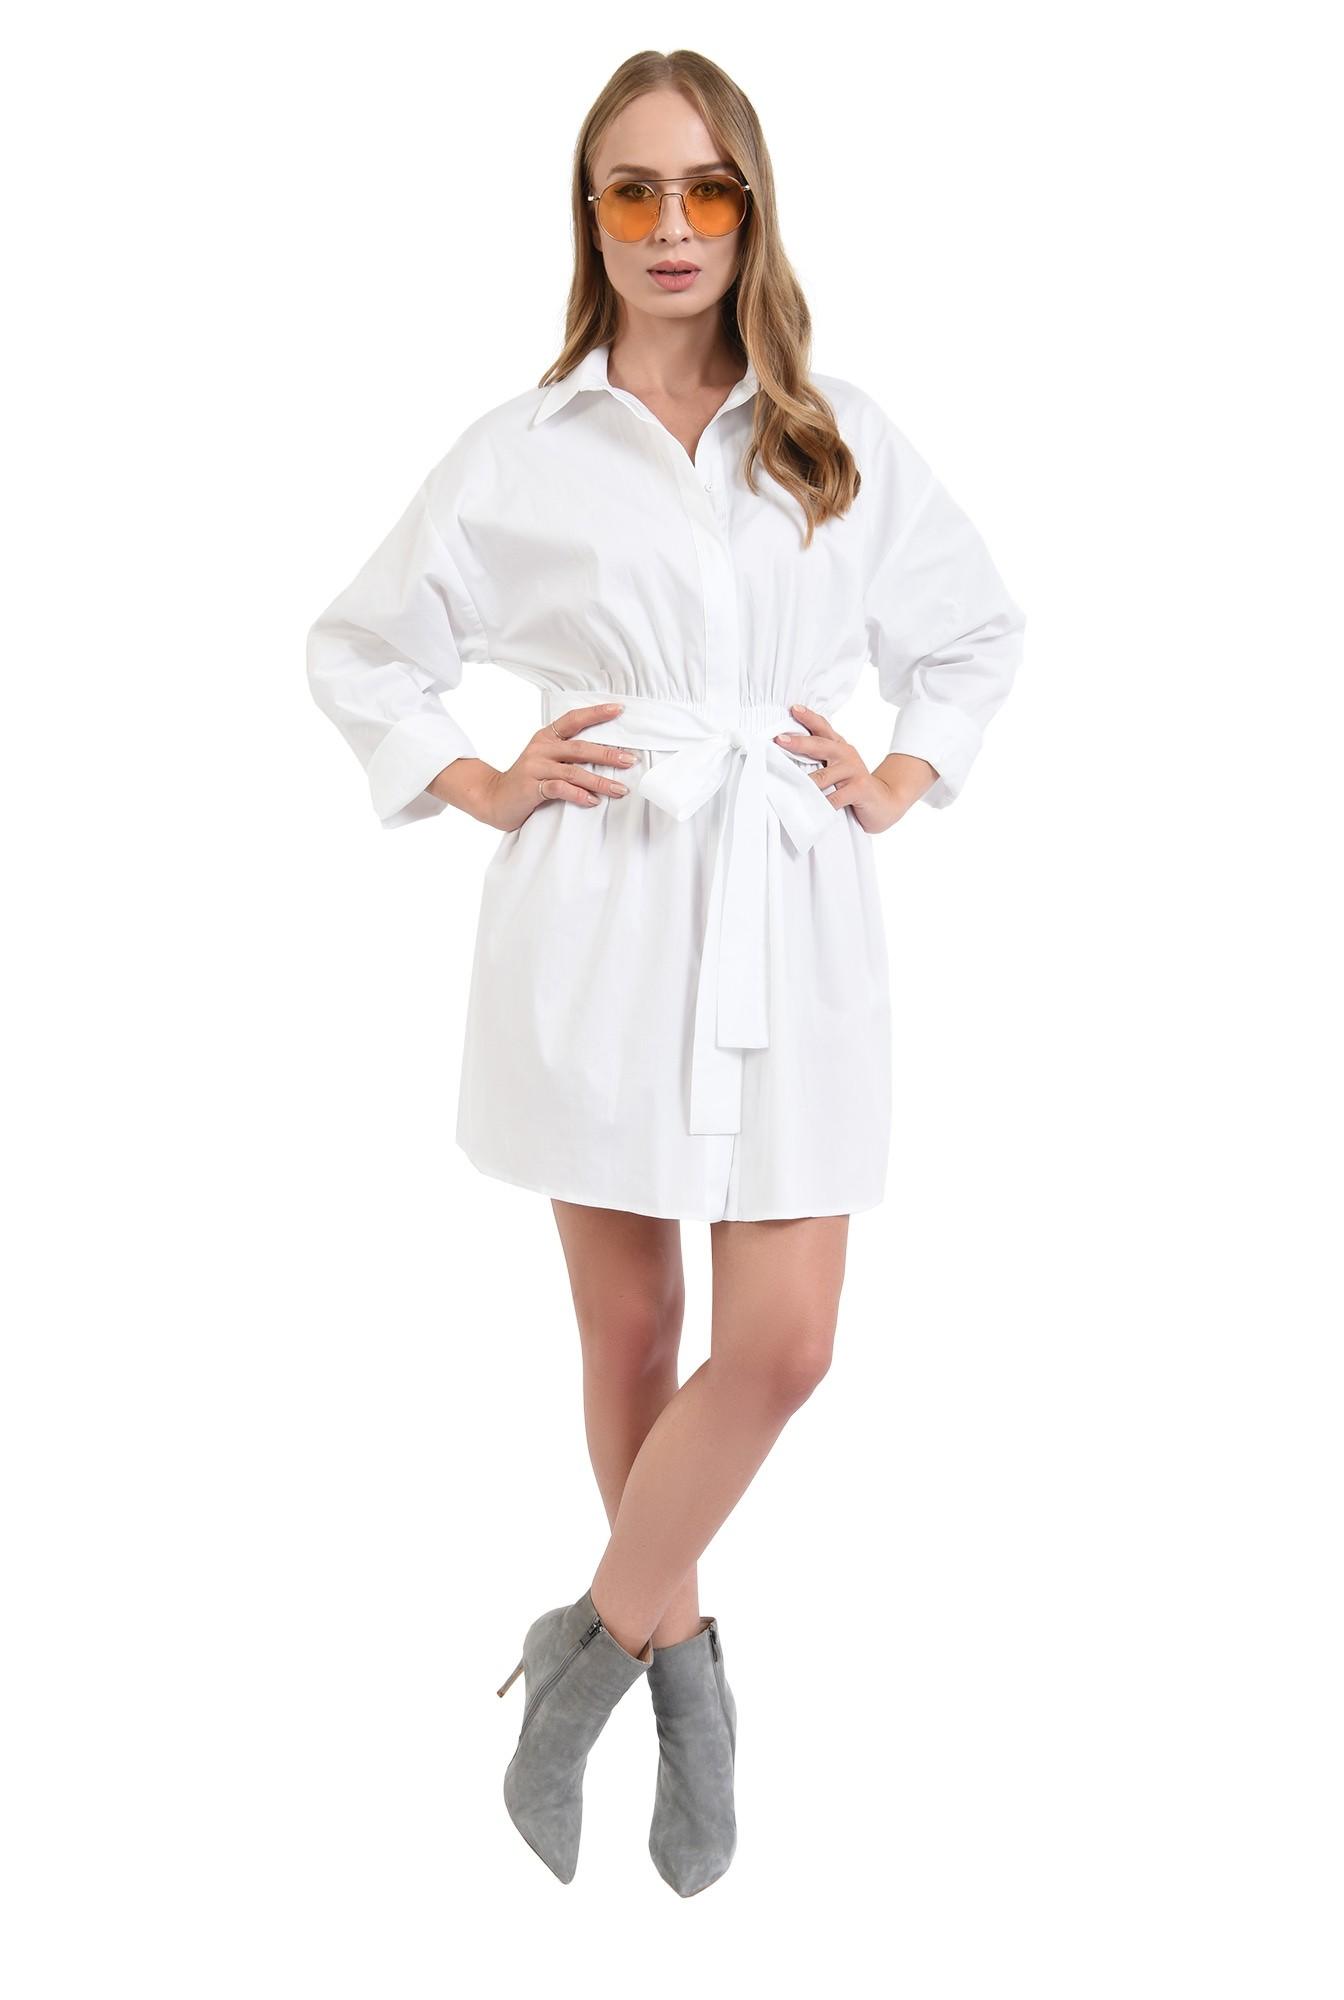 360 - rochie camasa, mini, cu cordon, nasturi ascunsi, Poema, alb